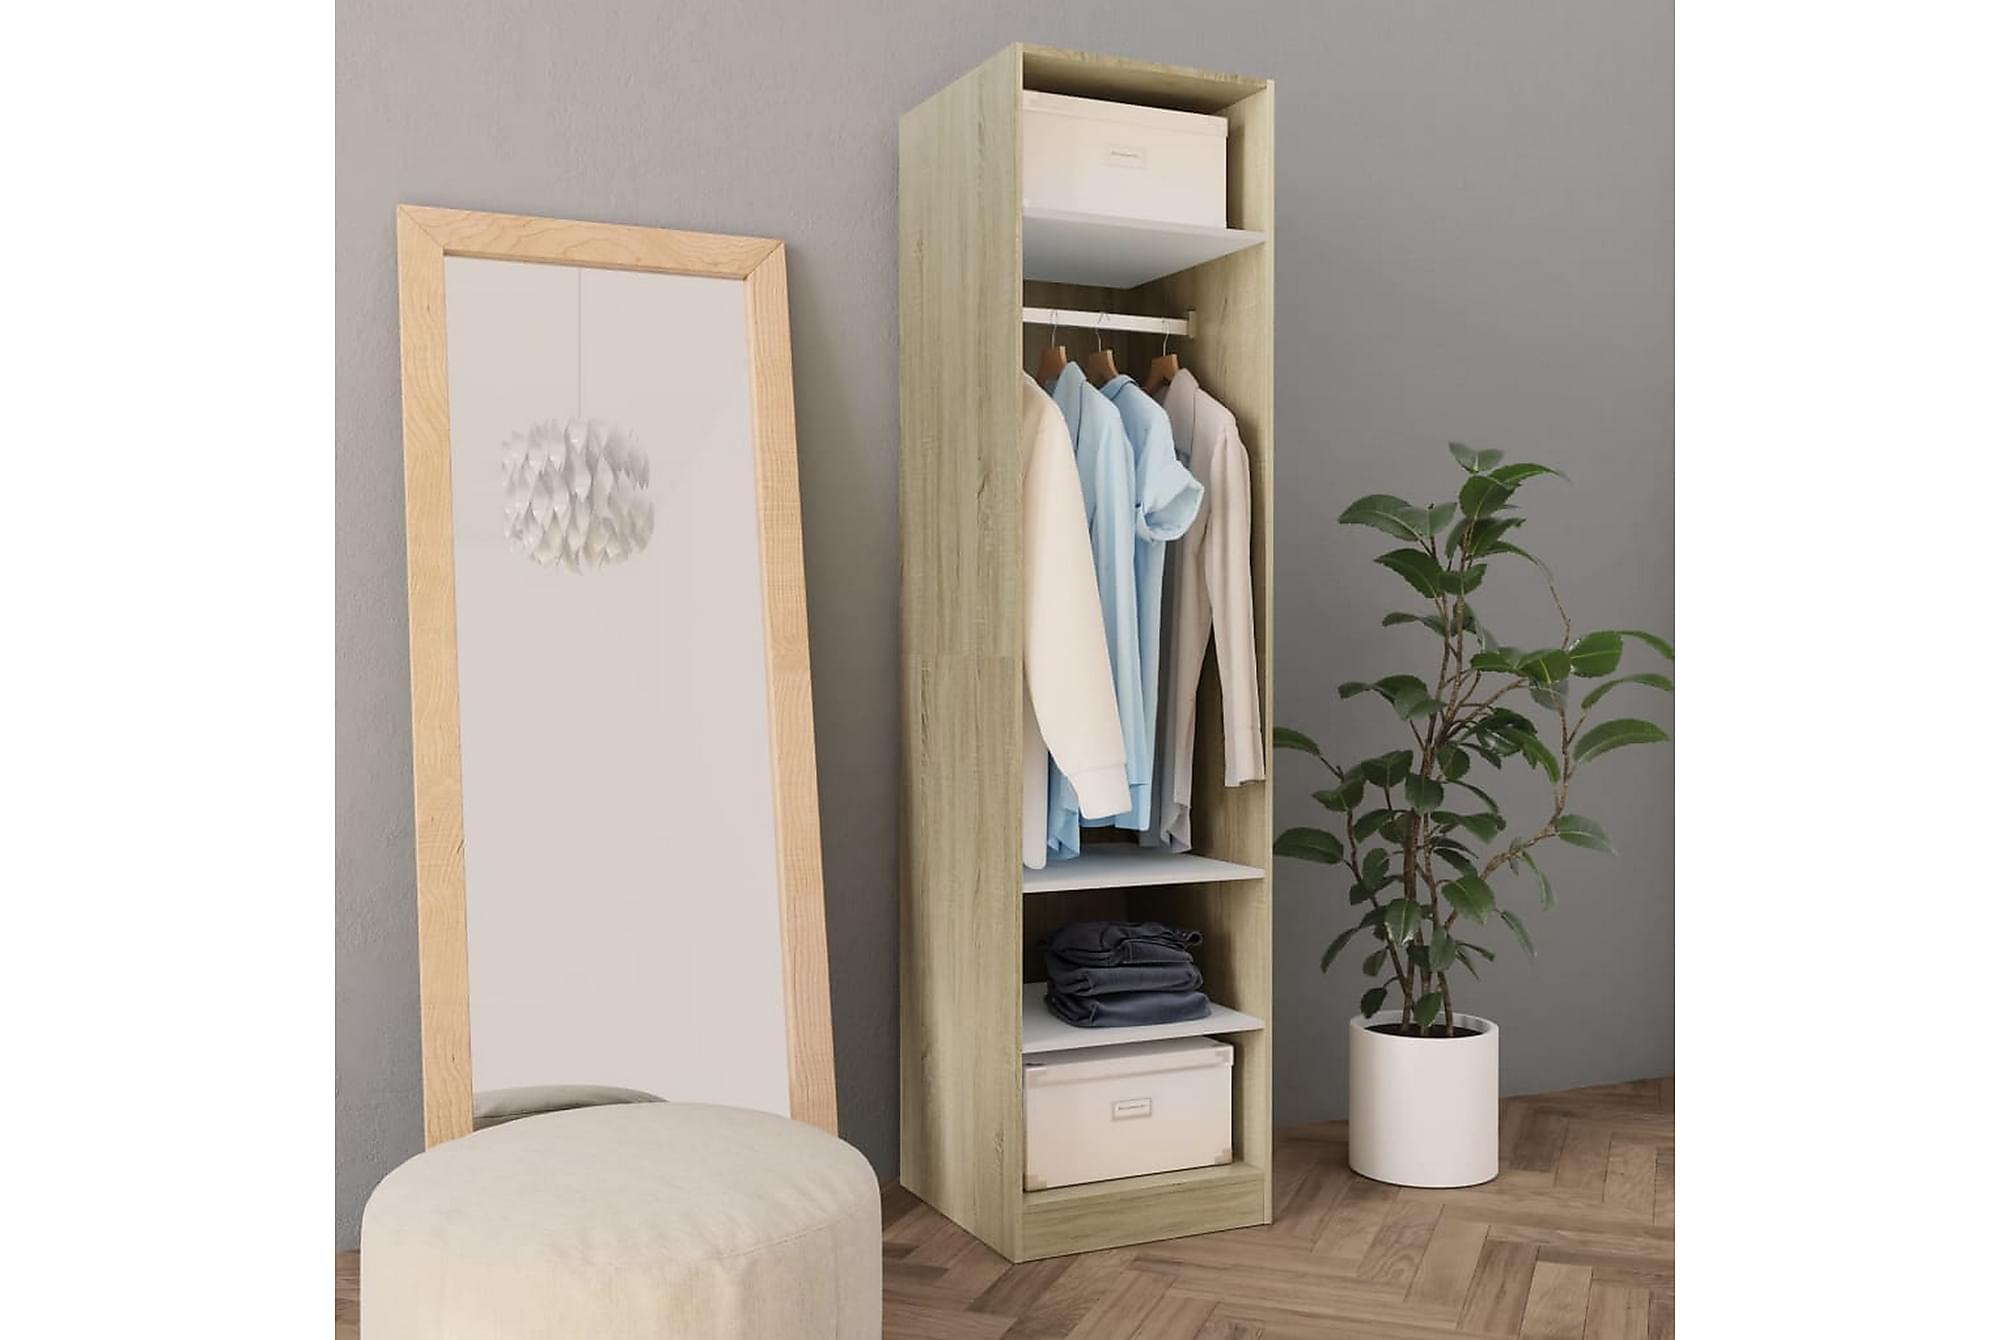 Garderob vit och sonoma-ek 50x50x200 cm spånskiva